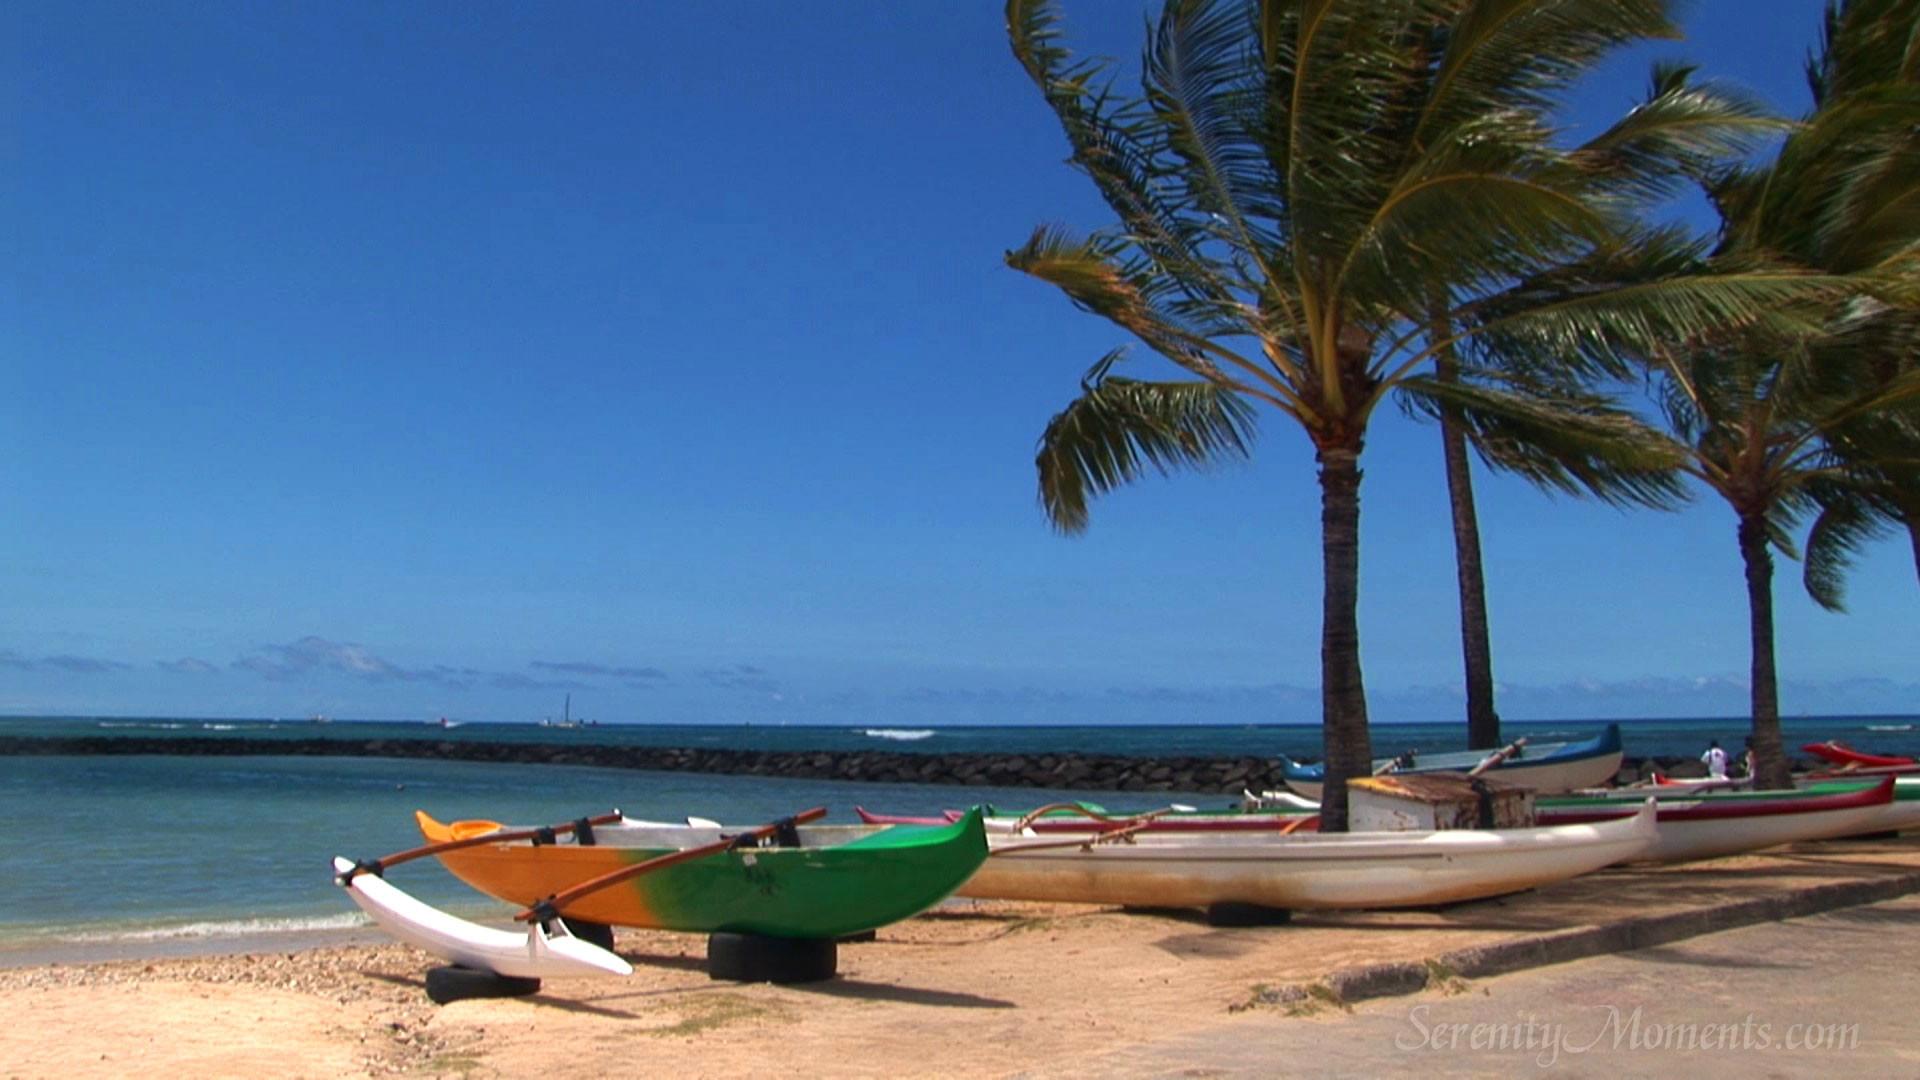 Free Screensavers Beach Scenes